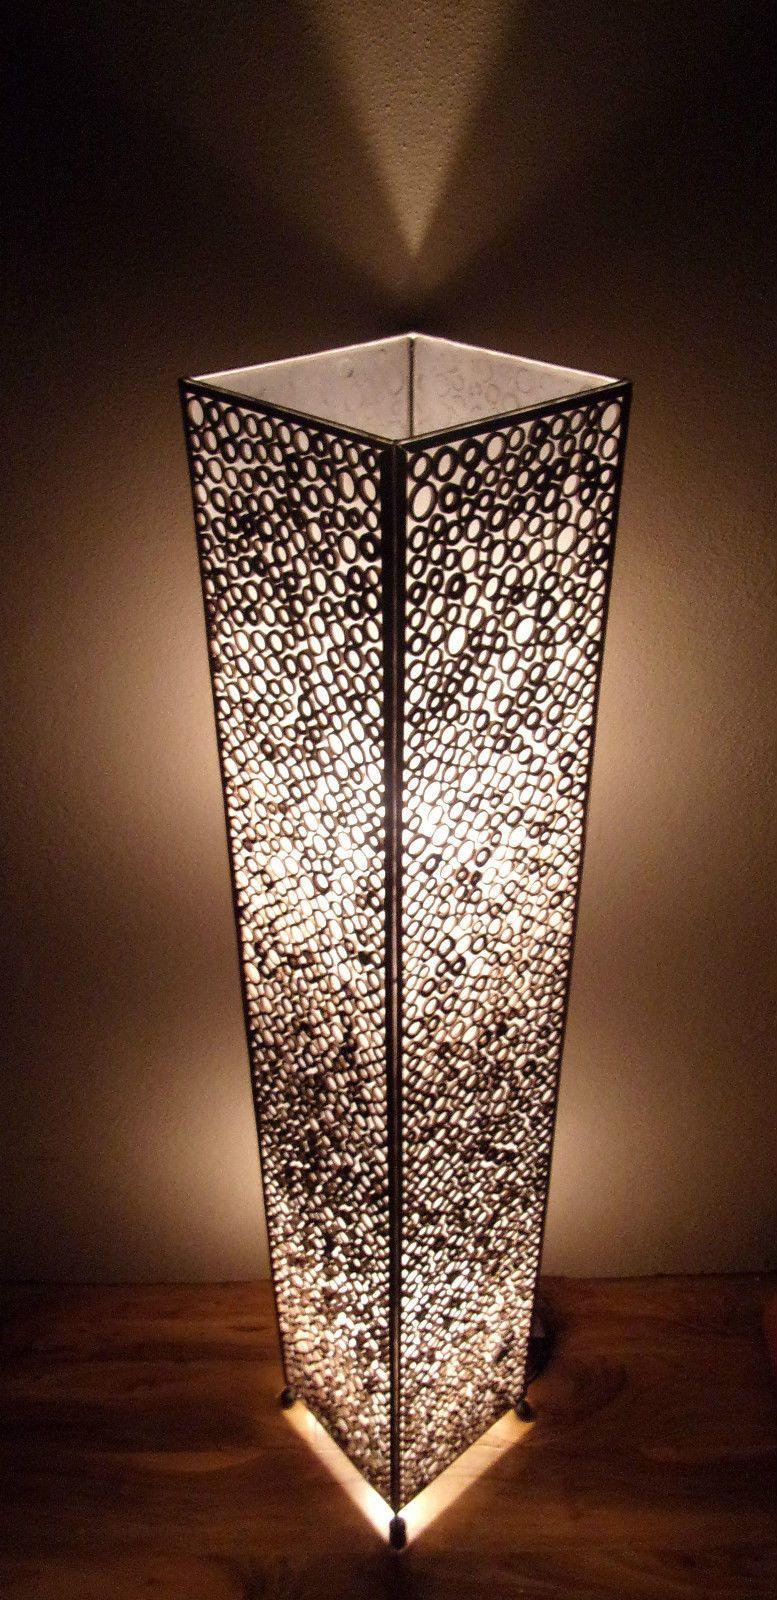 Pottery barn clift glass lamp ebay - Unusual Bamboo Circle Framed Box Lamp 150cm Hand Made Ethnic Bali Floor Lamp